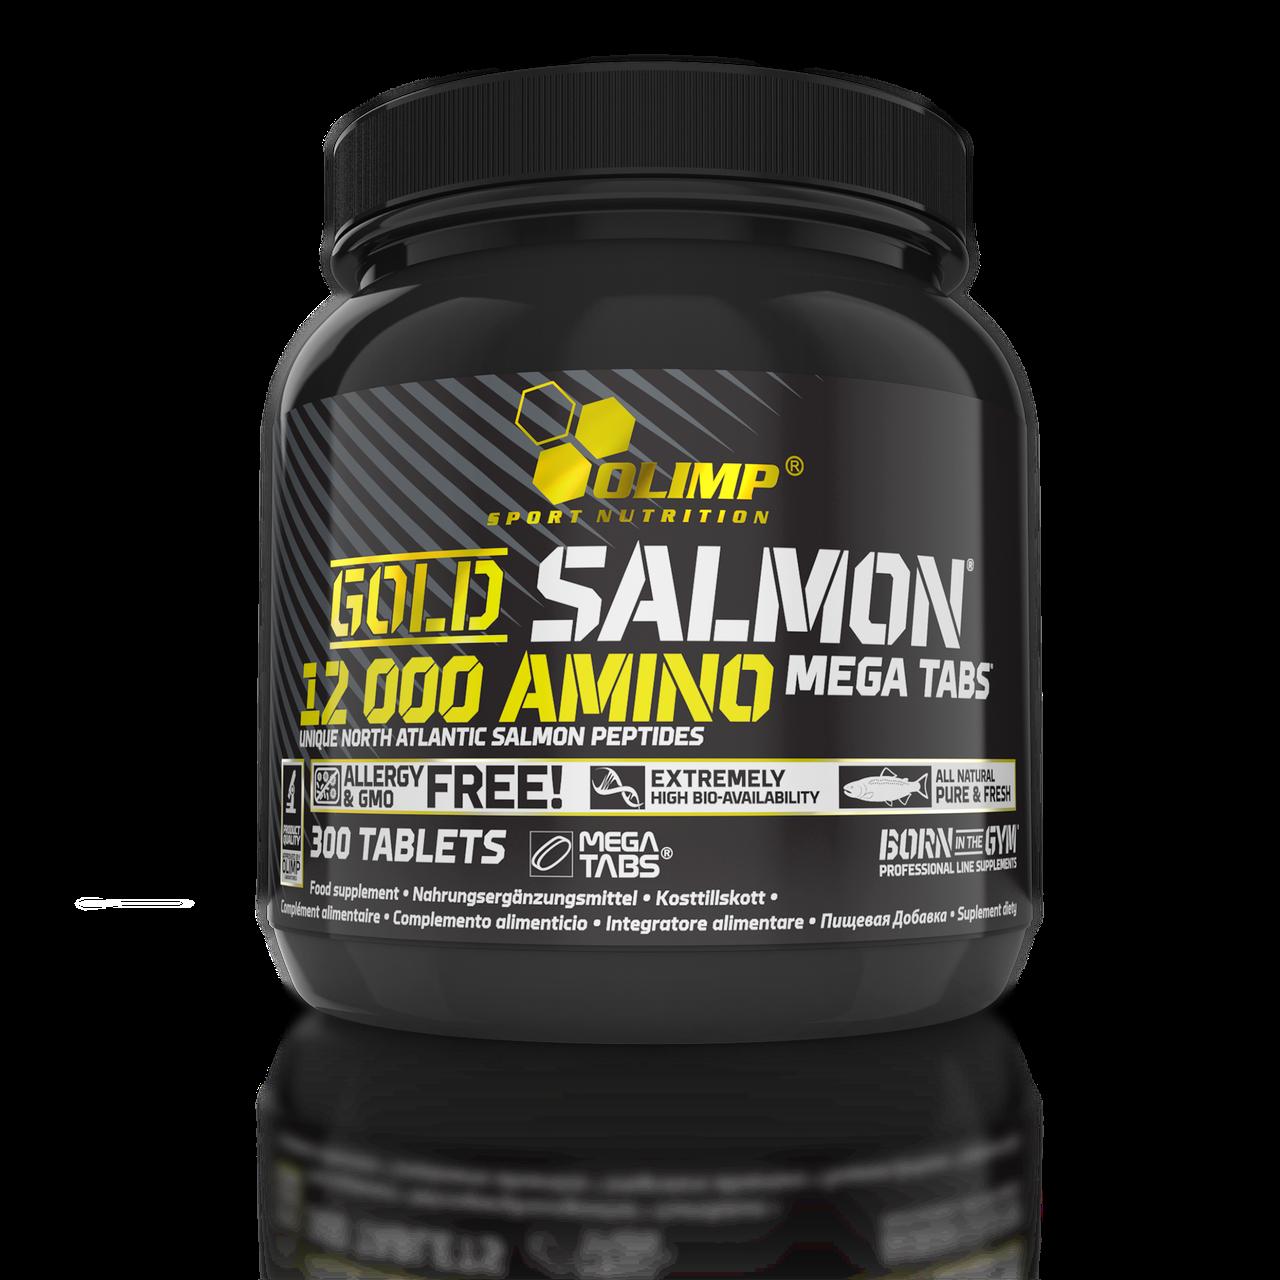 Аминокислоты Olimp Gold Salmon 12000 Amino mega tabs 300 tabs